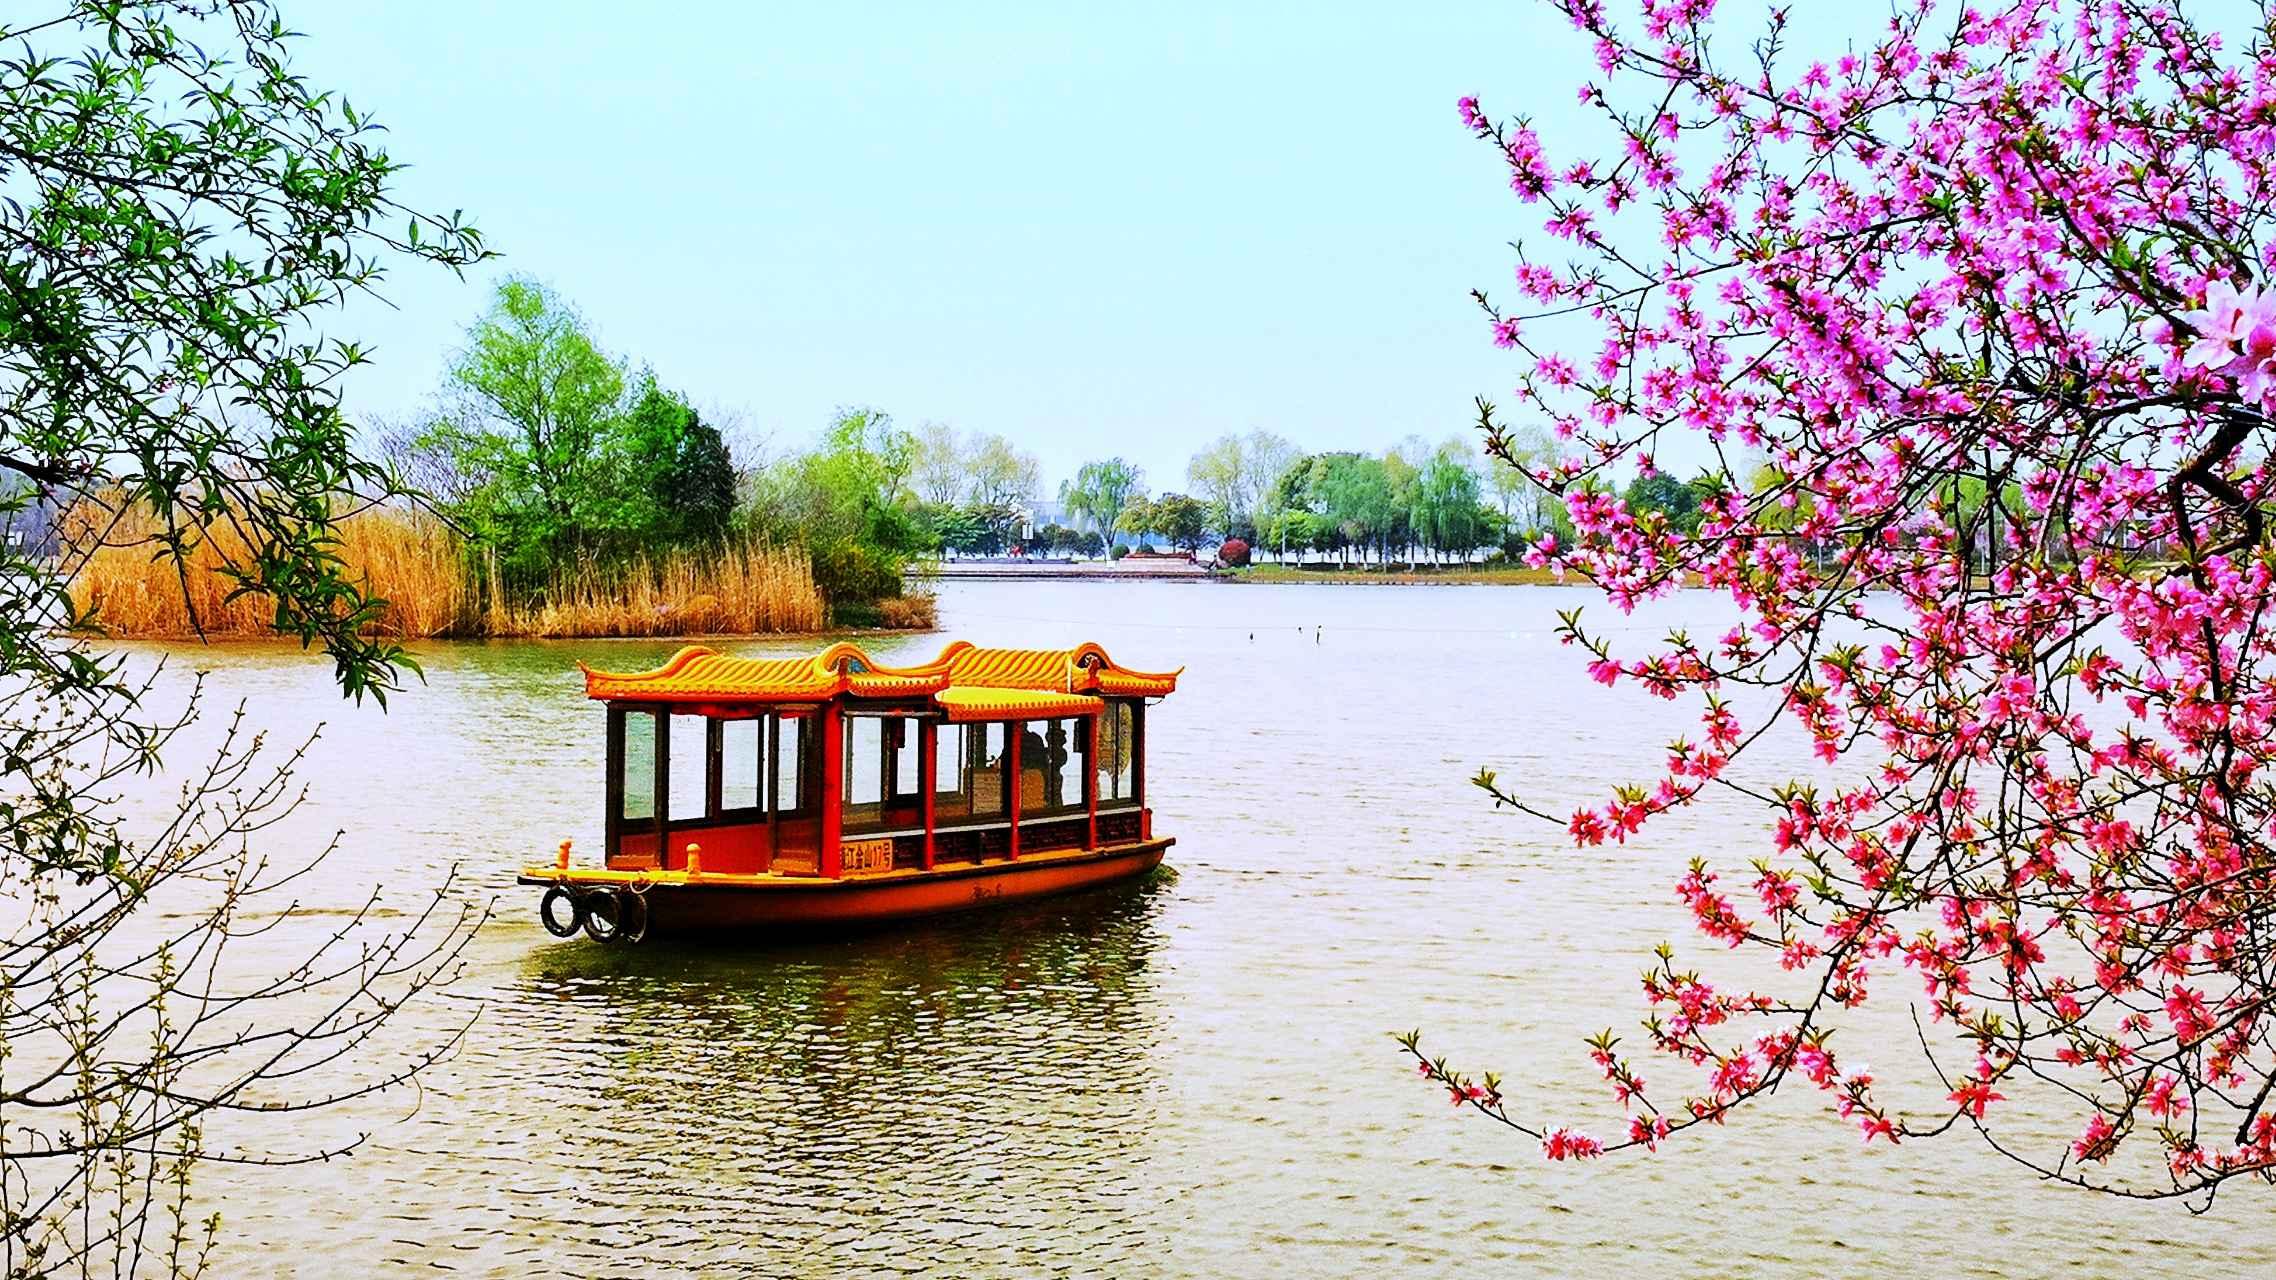 _IMG_20180329_142410-01-01三月下扬州 最美瘦西湖.jpeg